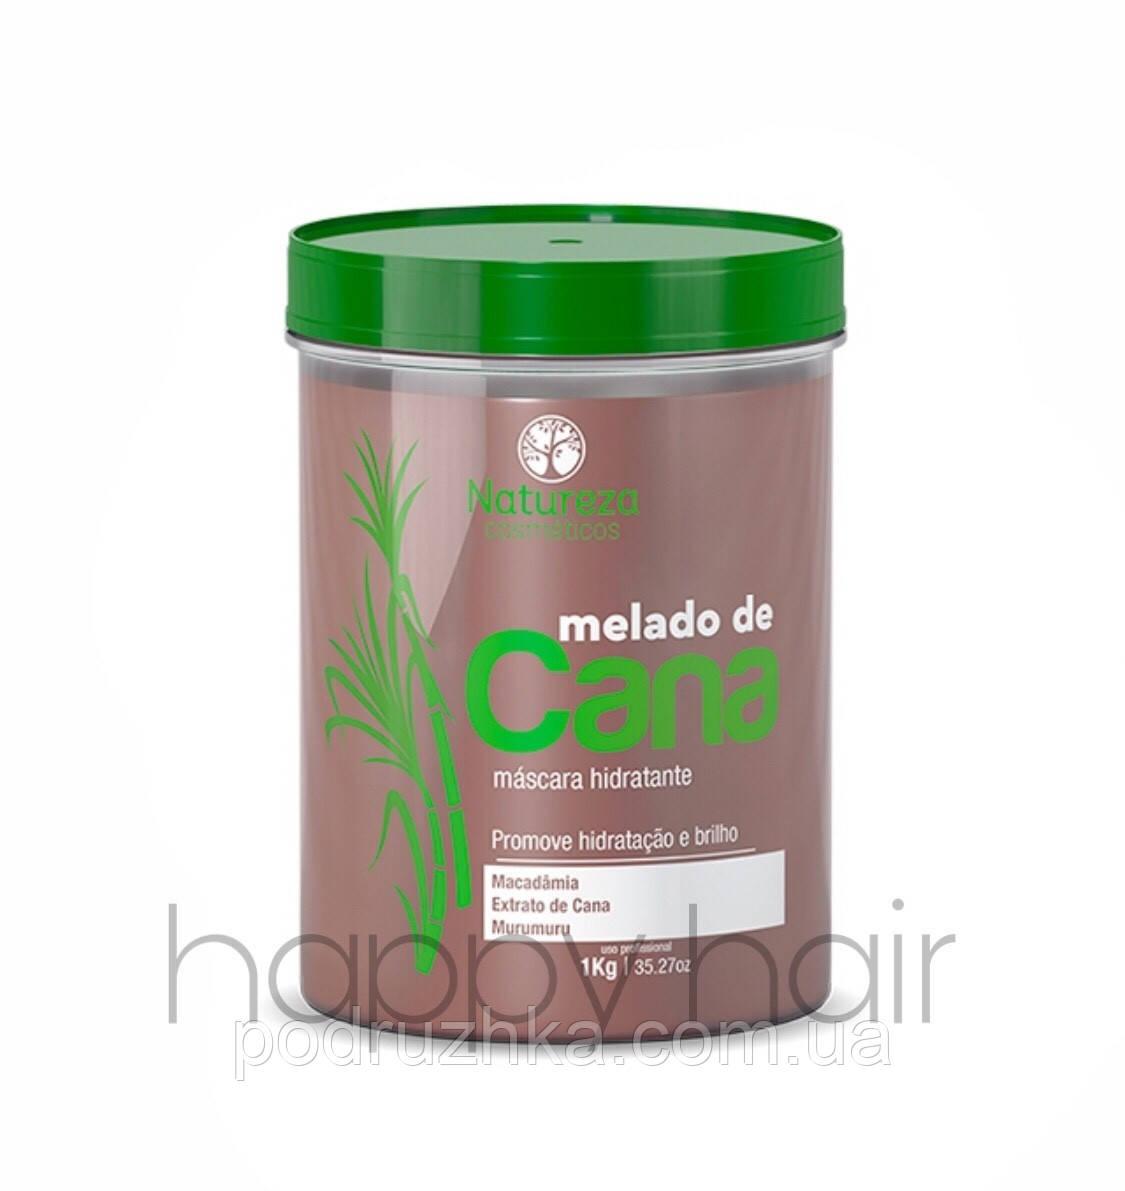 NATUREZA Melado de Cana Máscara Hidratante Ботокс-гиперувлажнение для волос 1000 г